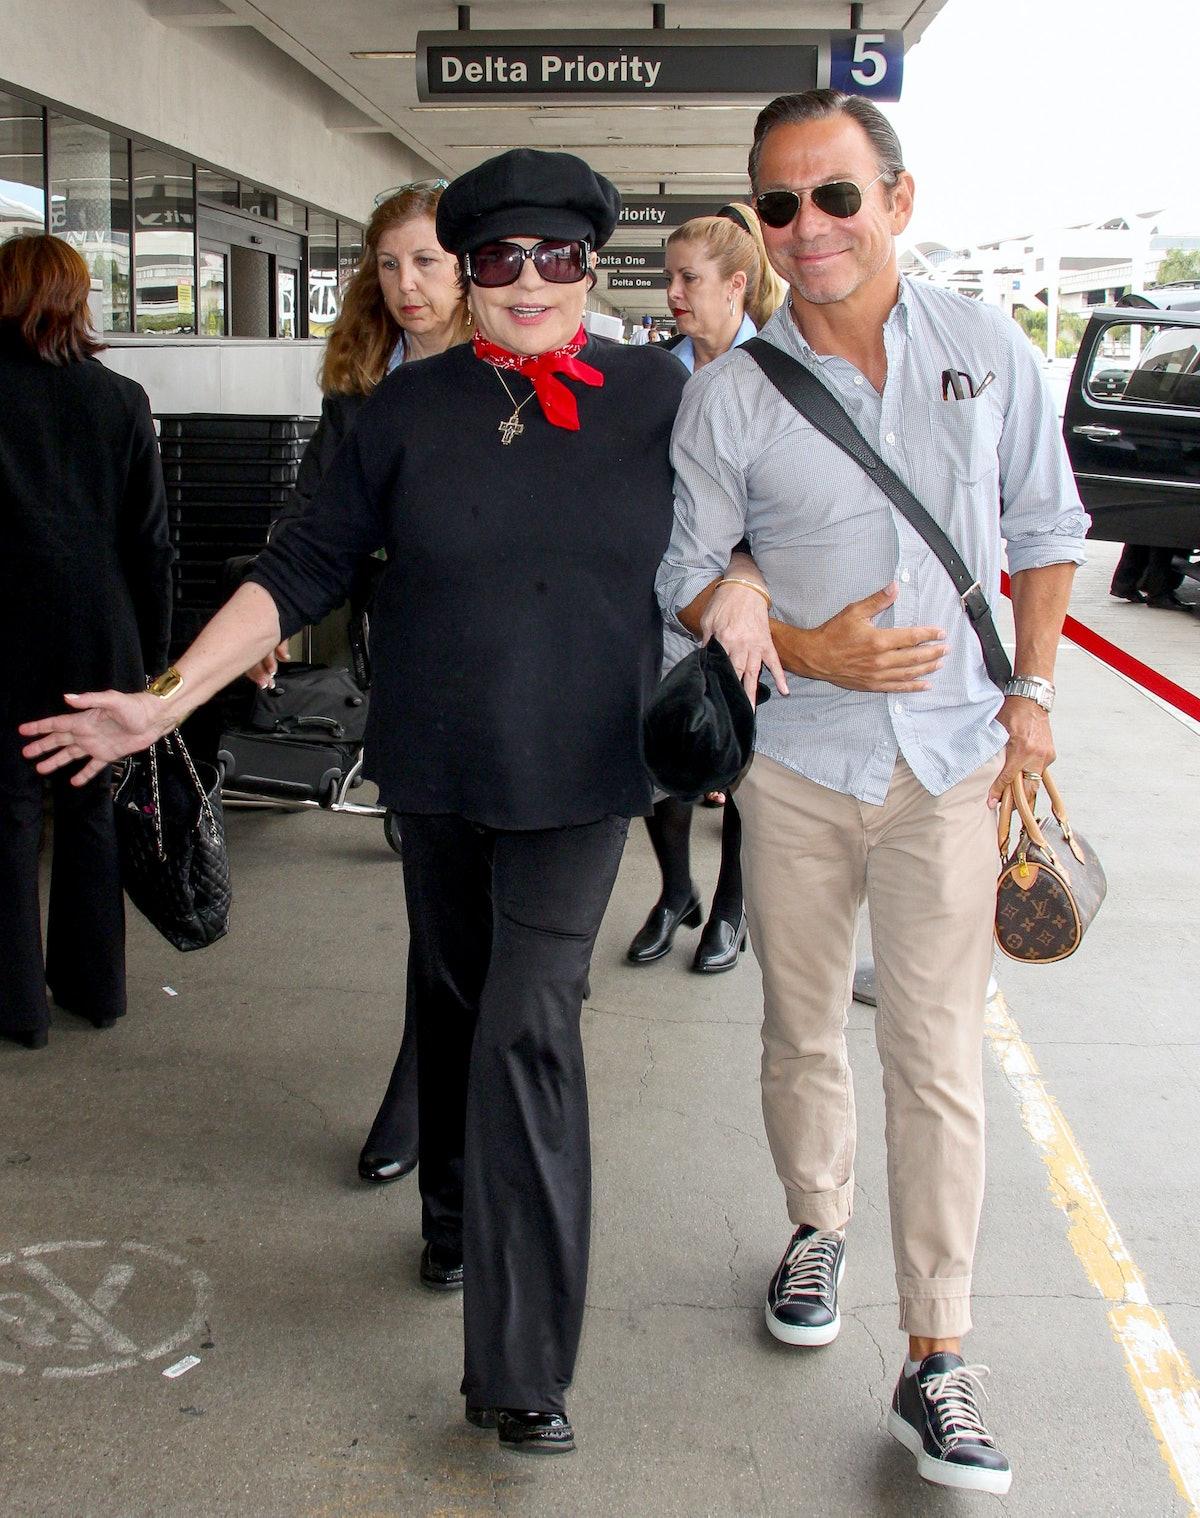 Liza at the airport